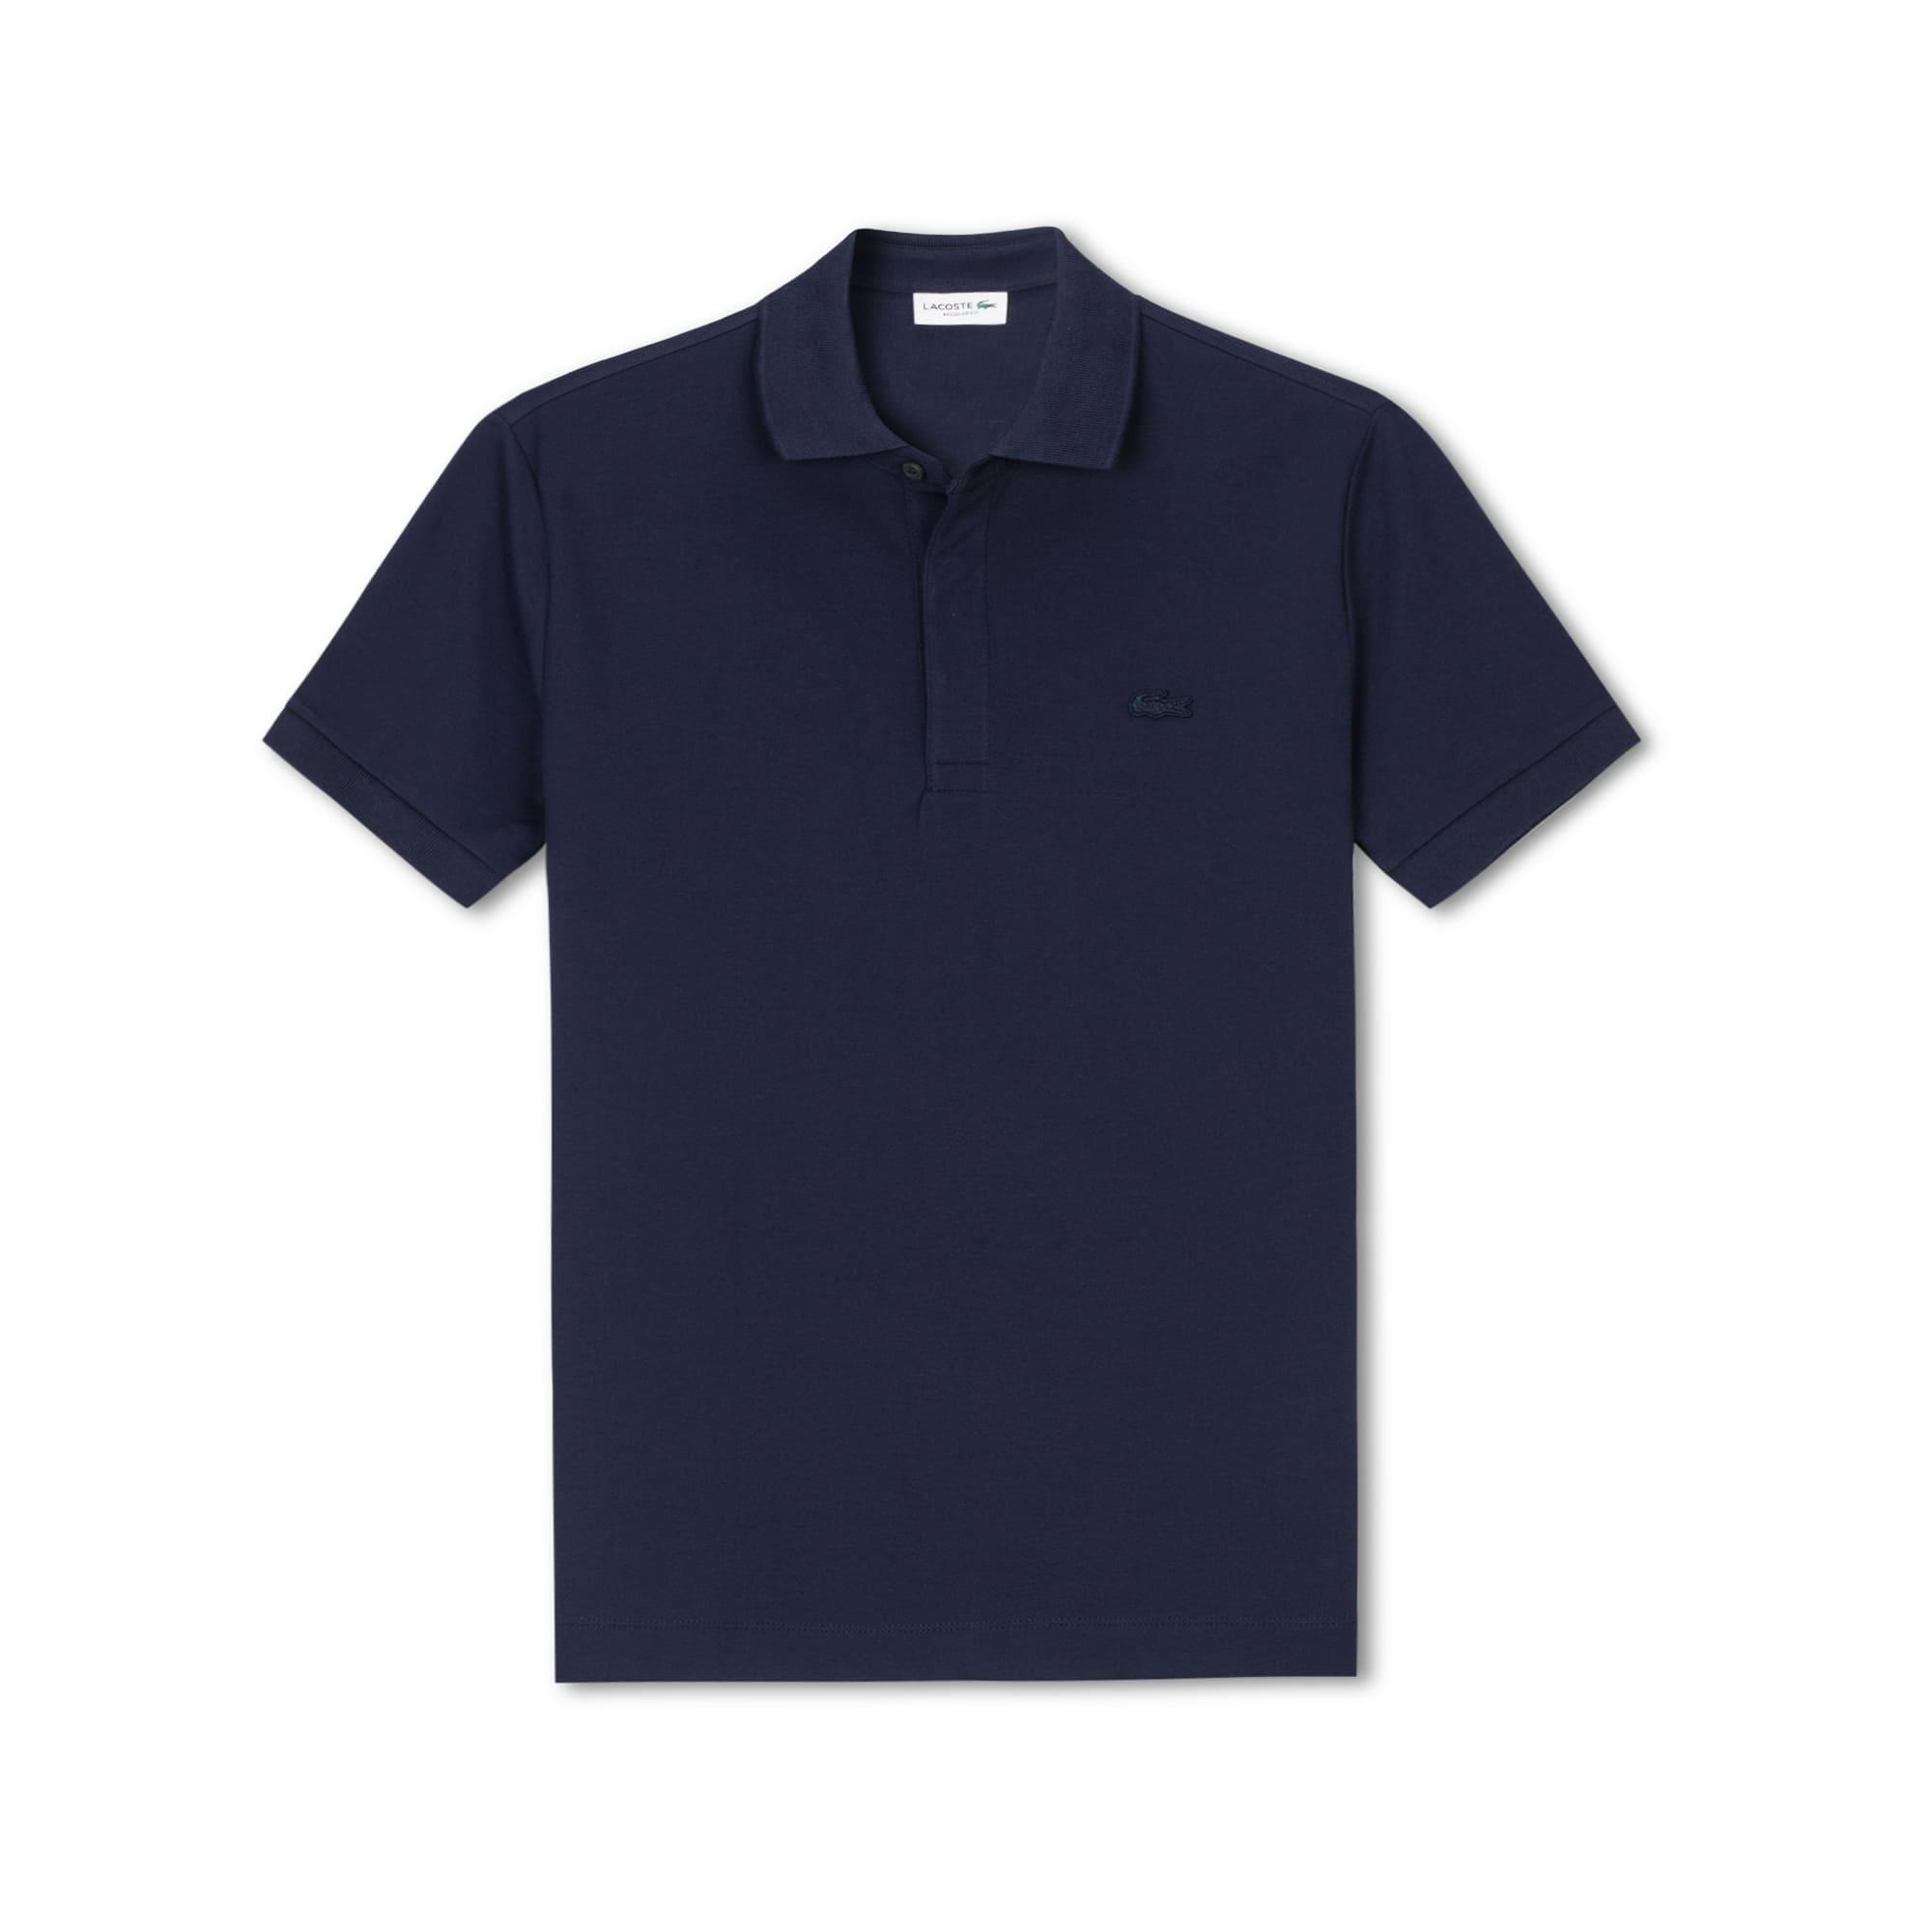 Lacoste常规版弹力棉凸纹网眼面料男士Paris Polo衫